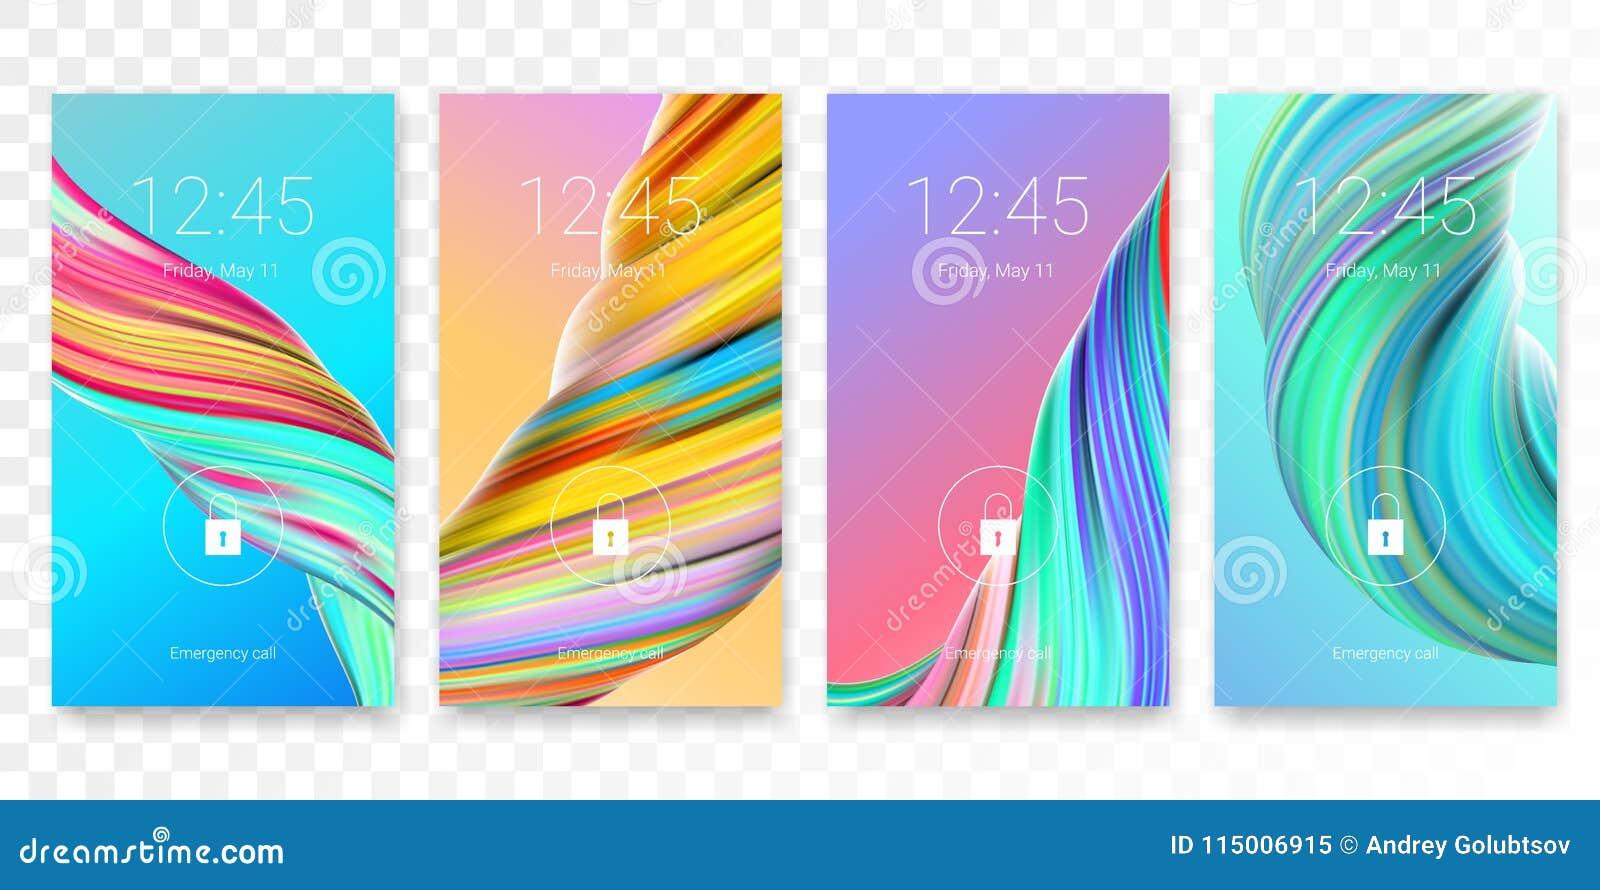 Download 510 Koleksi Wallpaper Android Vector Paling Keren